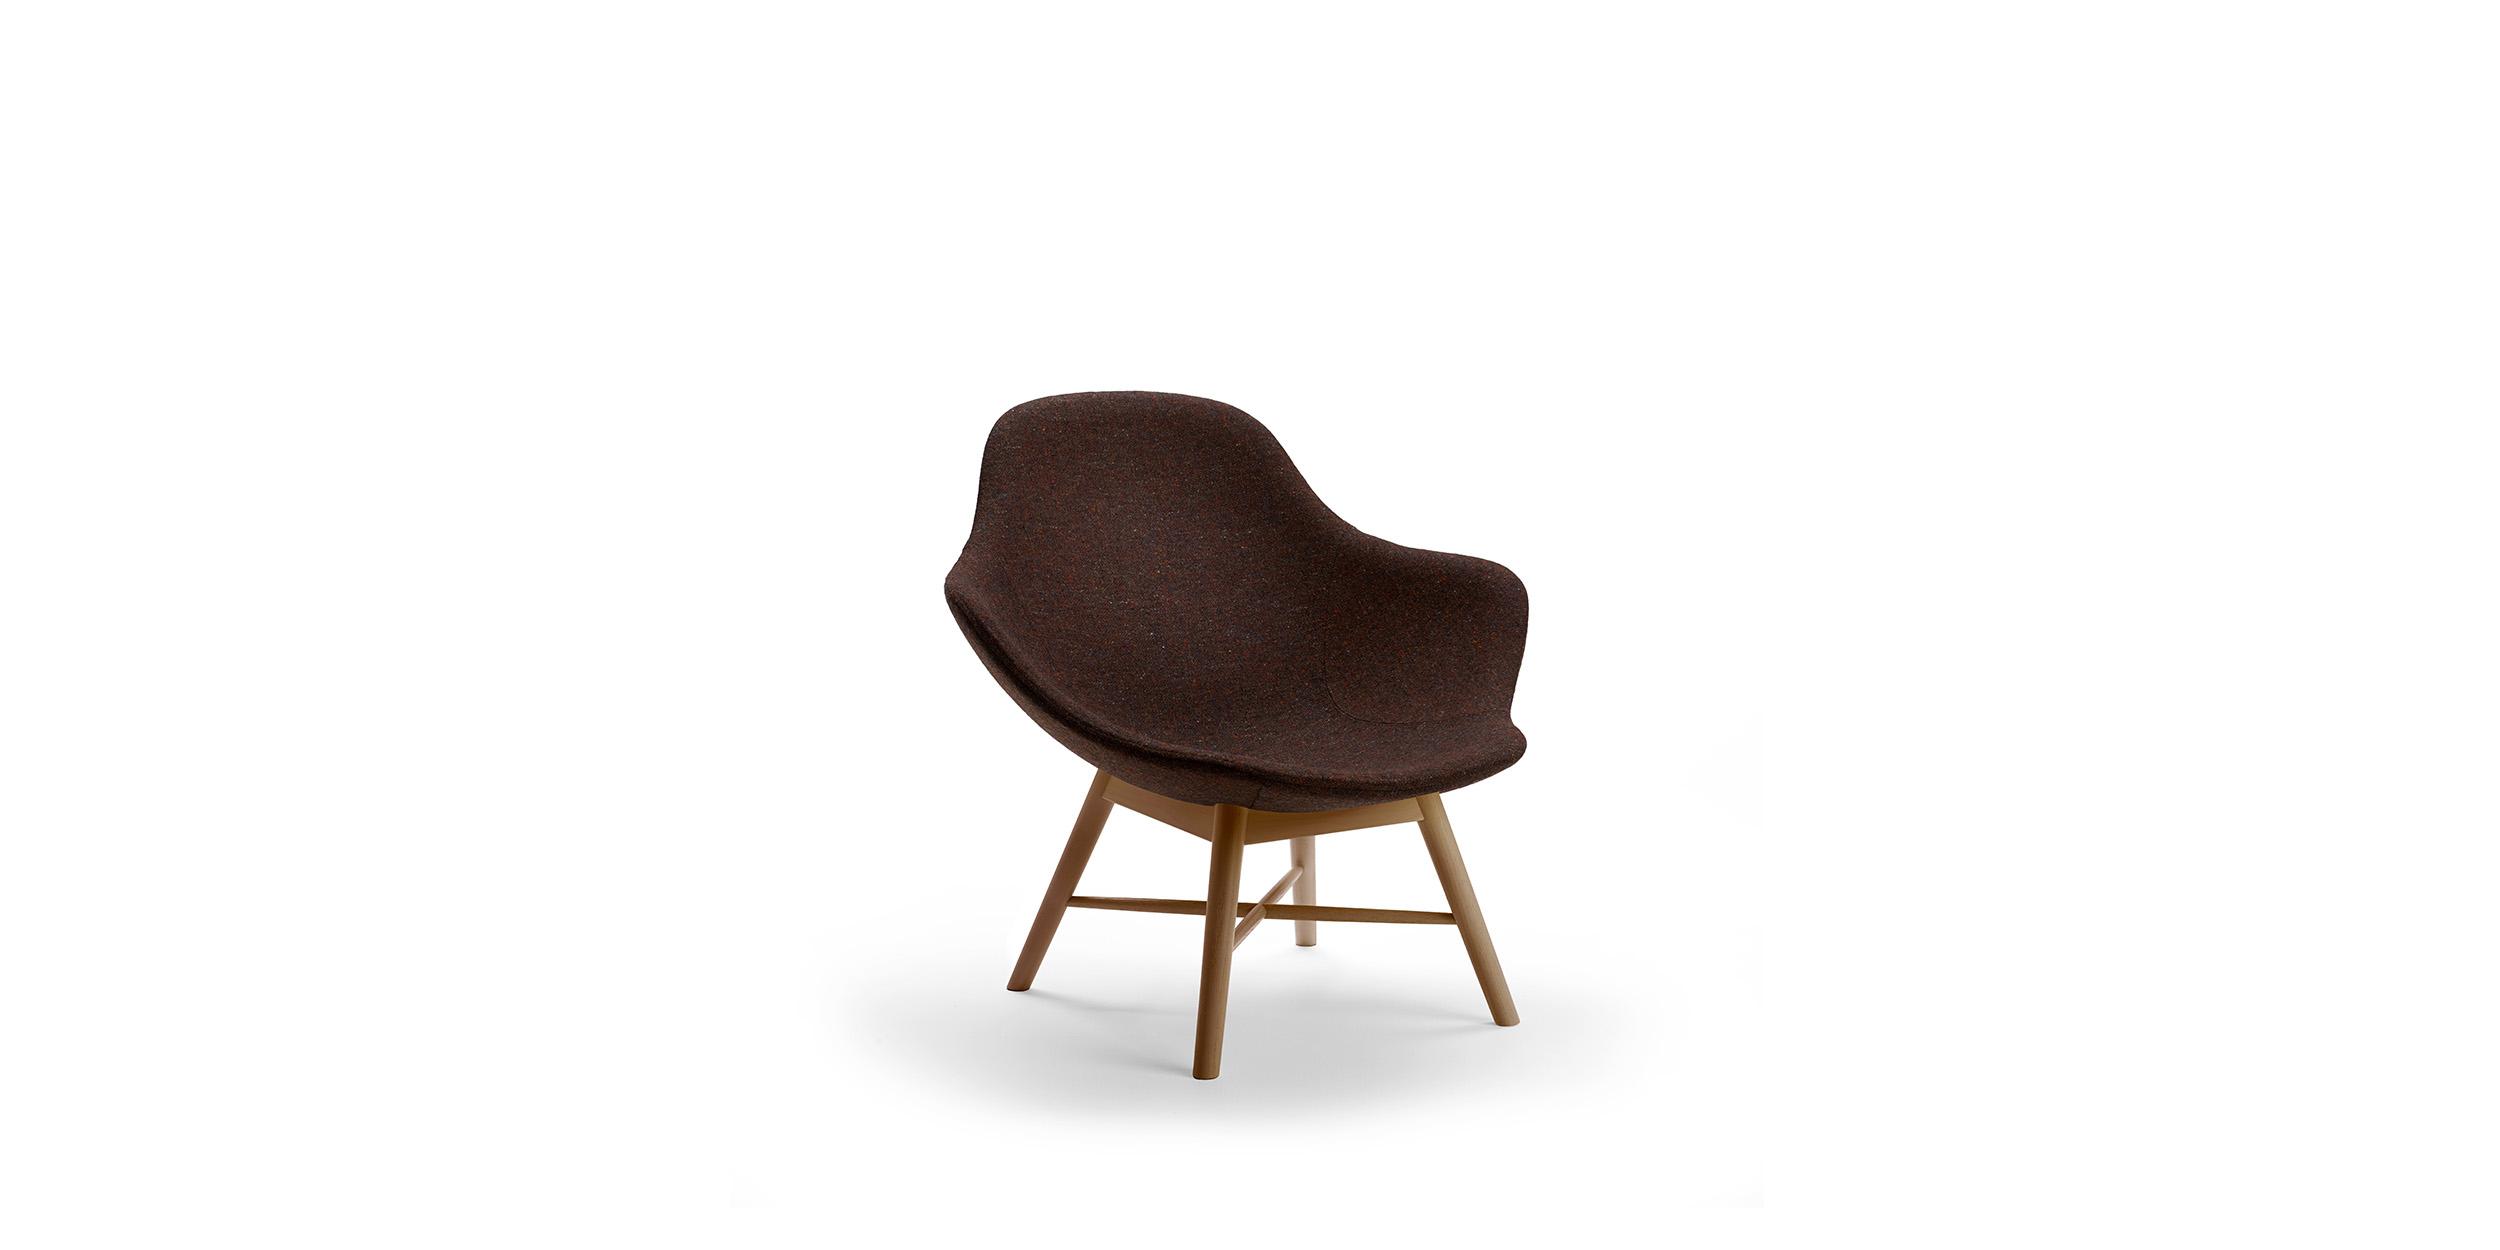 Palma Wood, Easy chair by Khodi Feiz